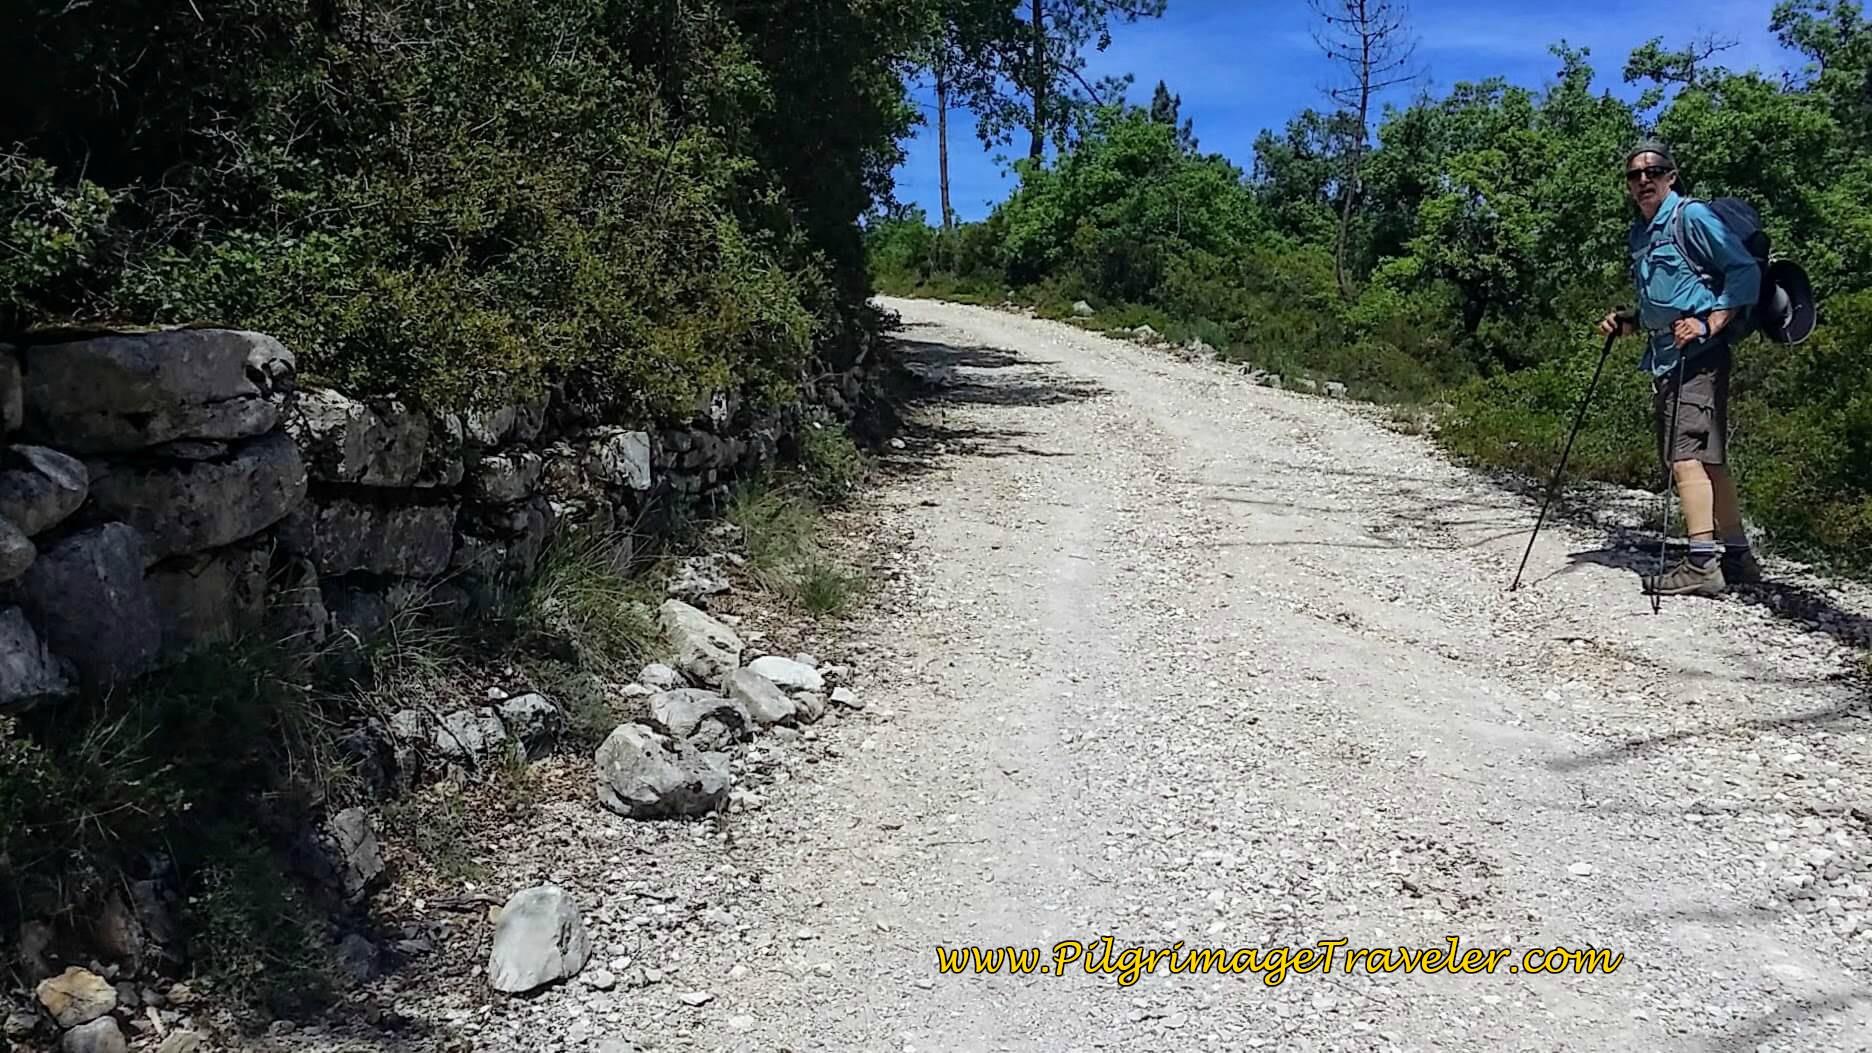 Gravel Road Towards Alvorge, Portugal